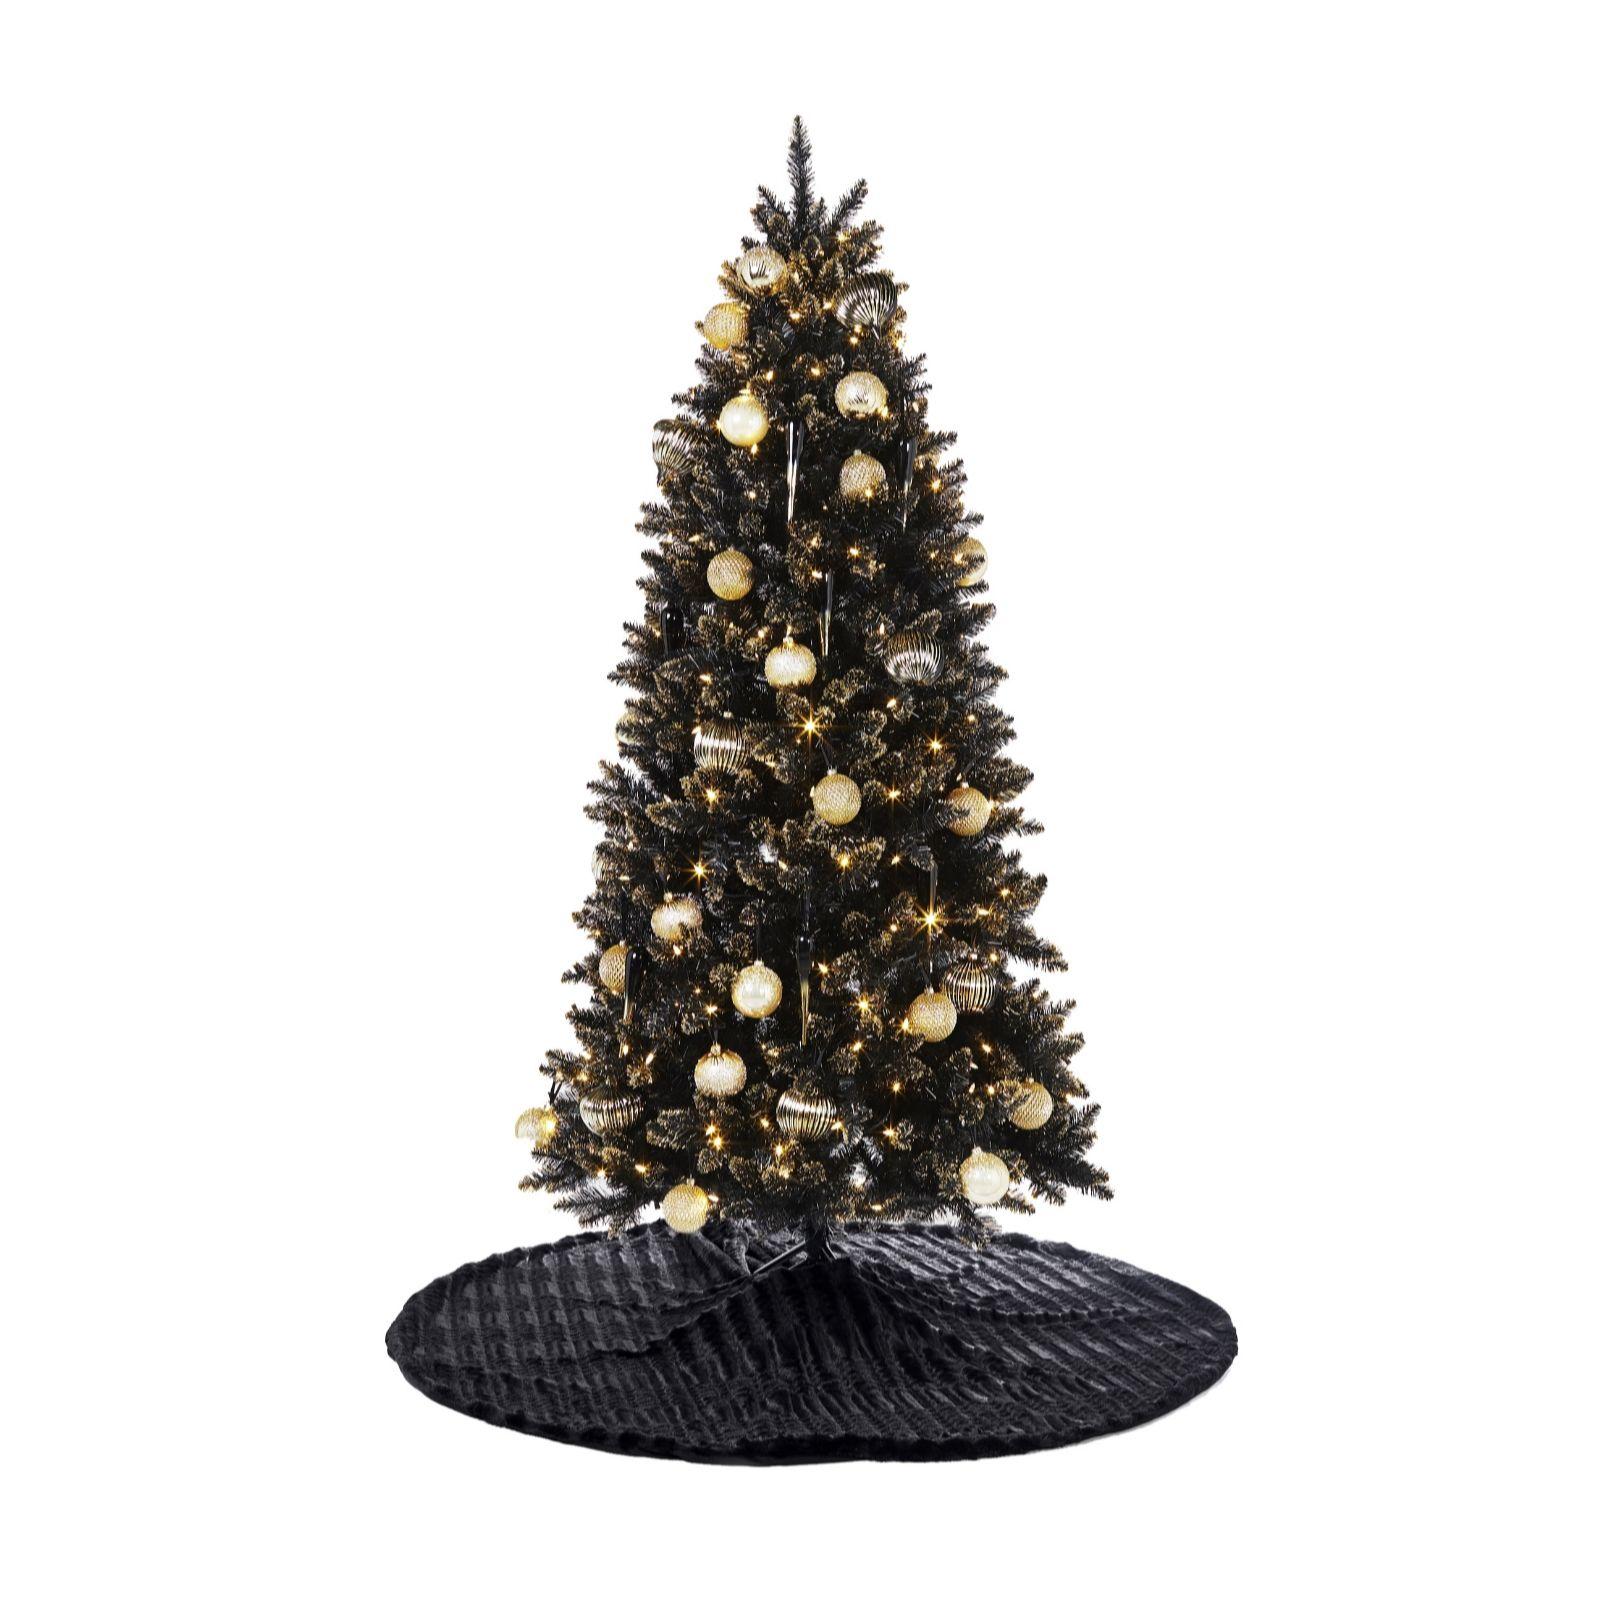 Qvc Christmas Decorations Uk